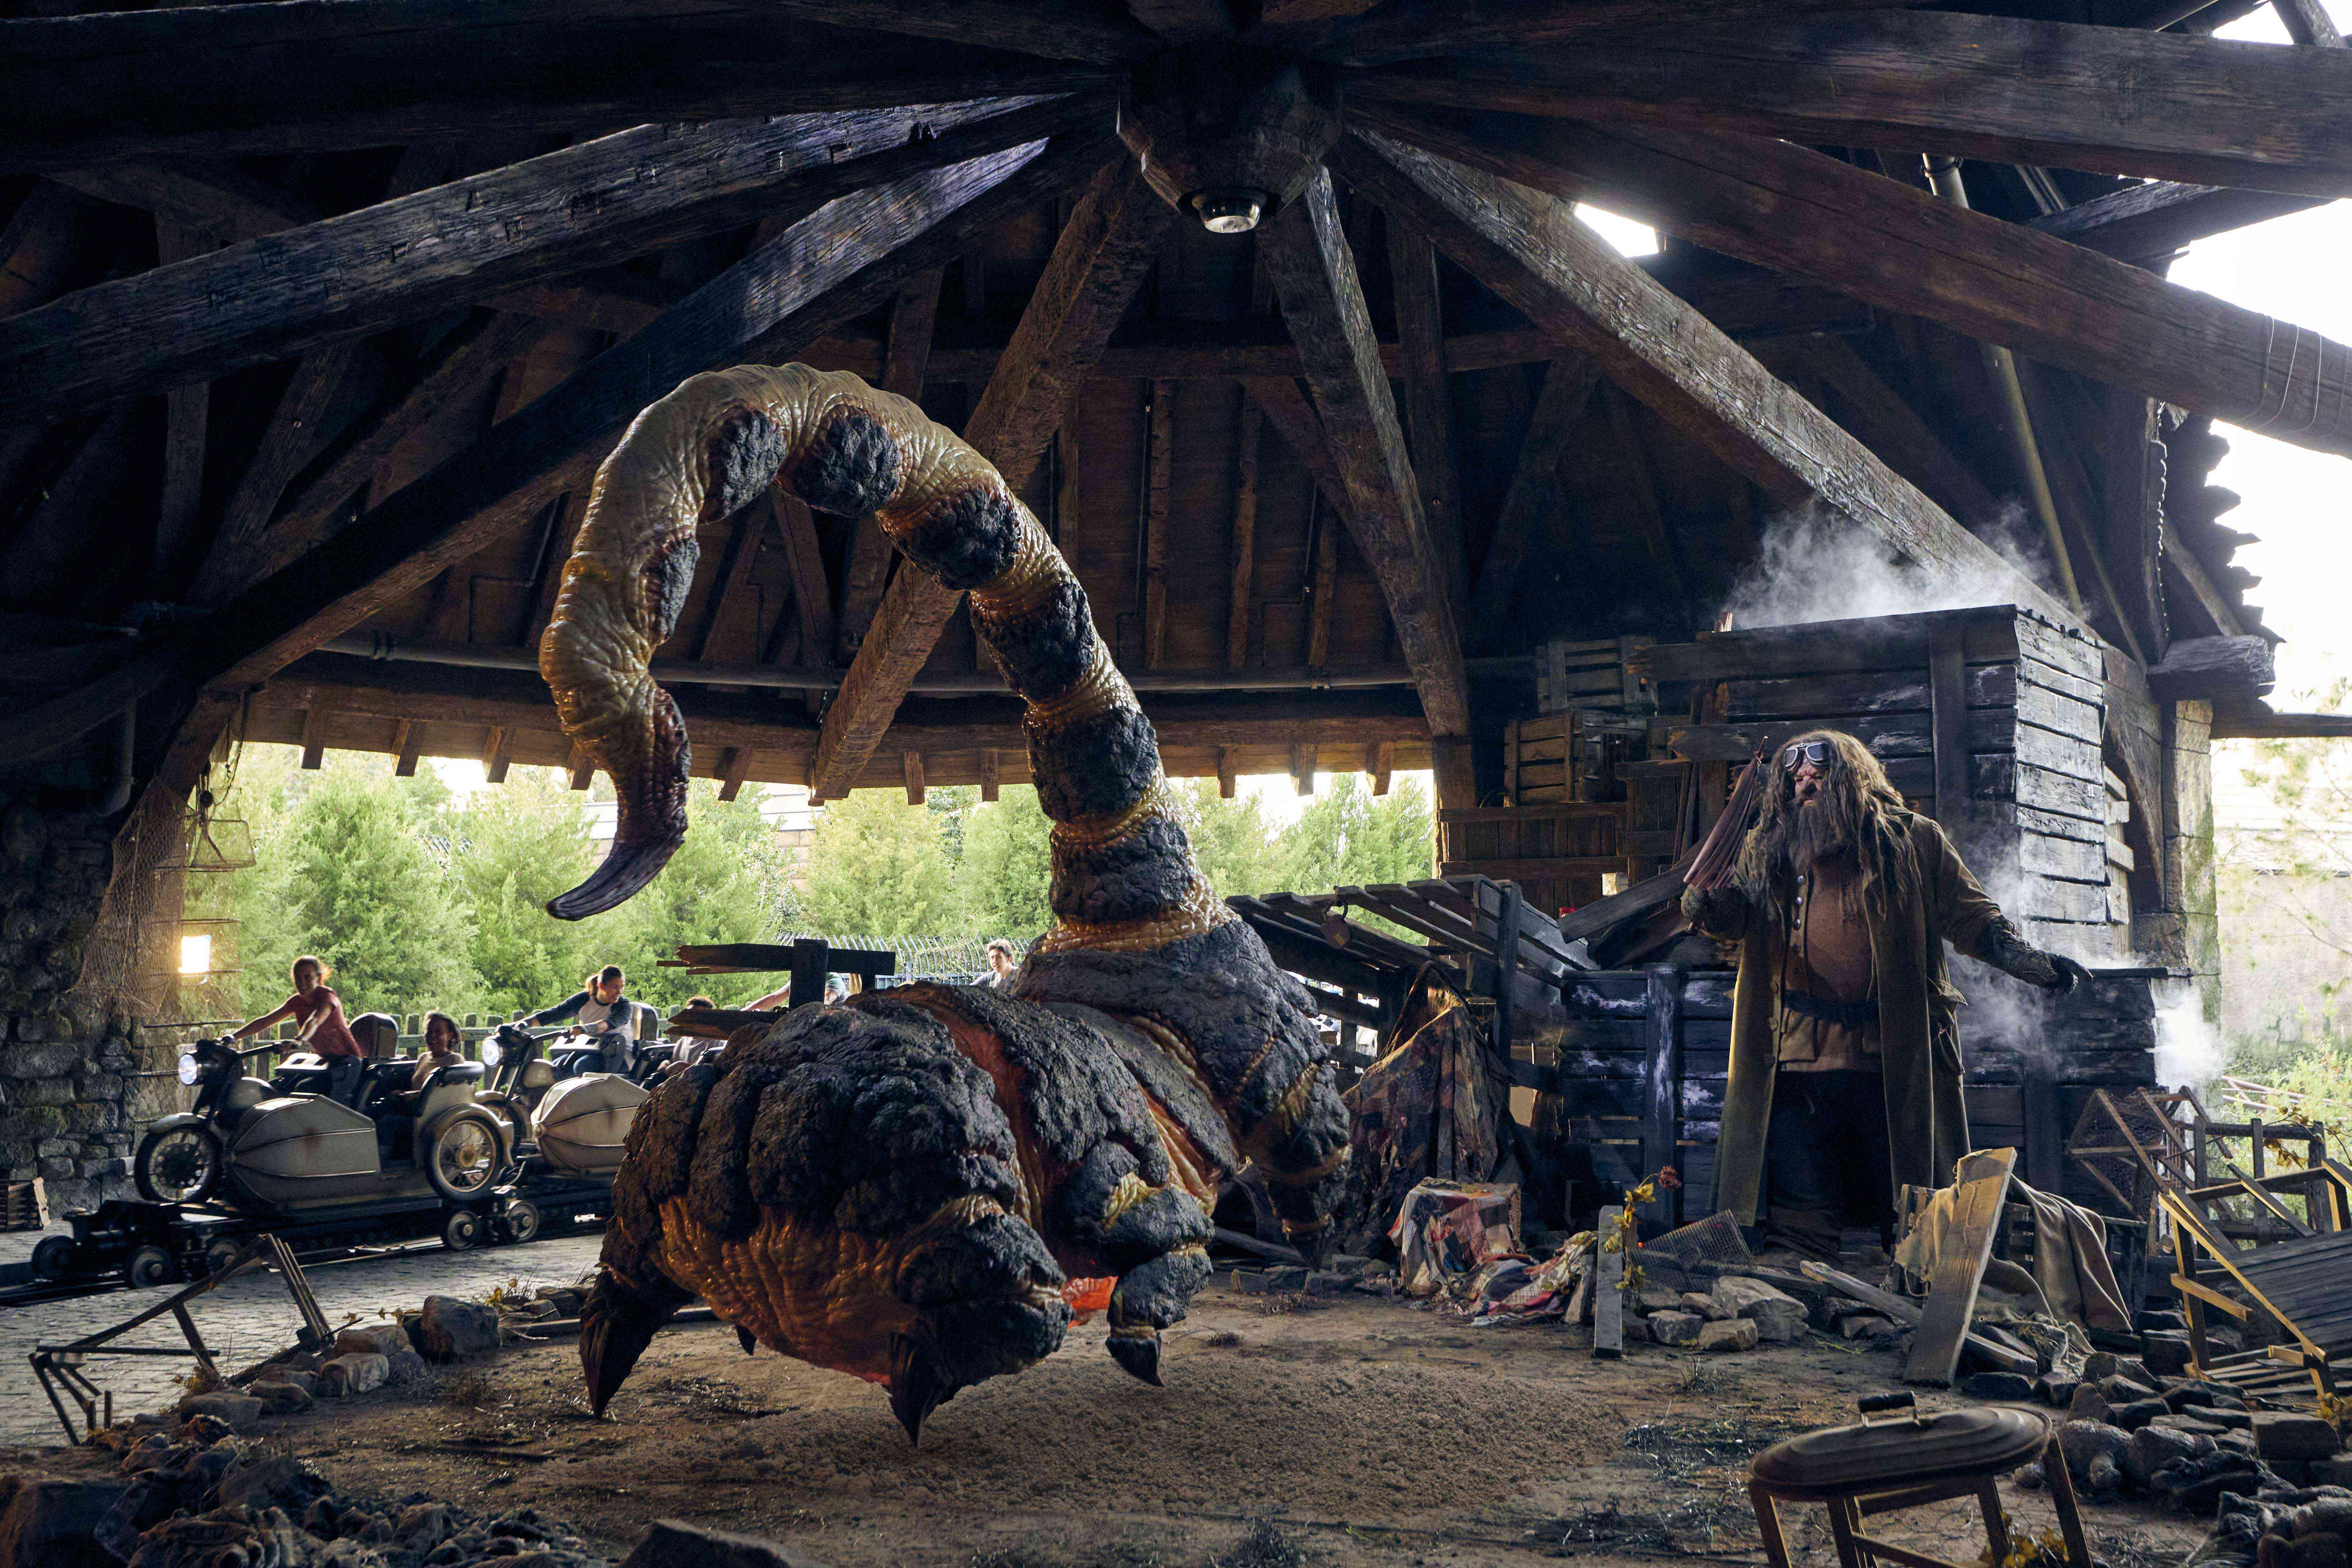 Blast-ended skrewt and hagrid animatronic at Universal Studioss